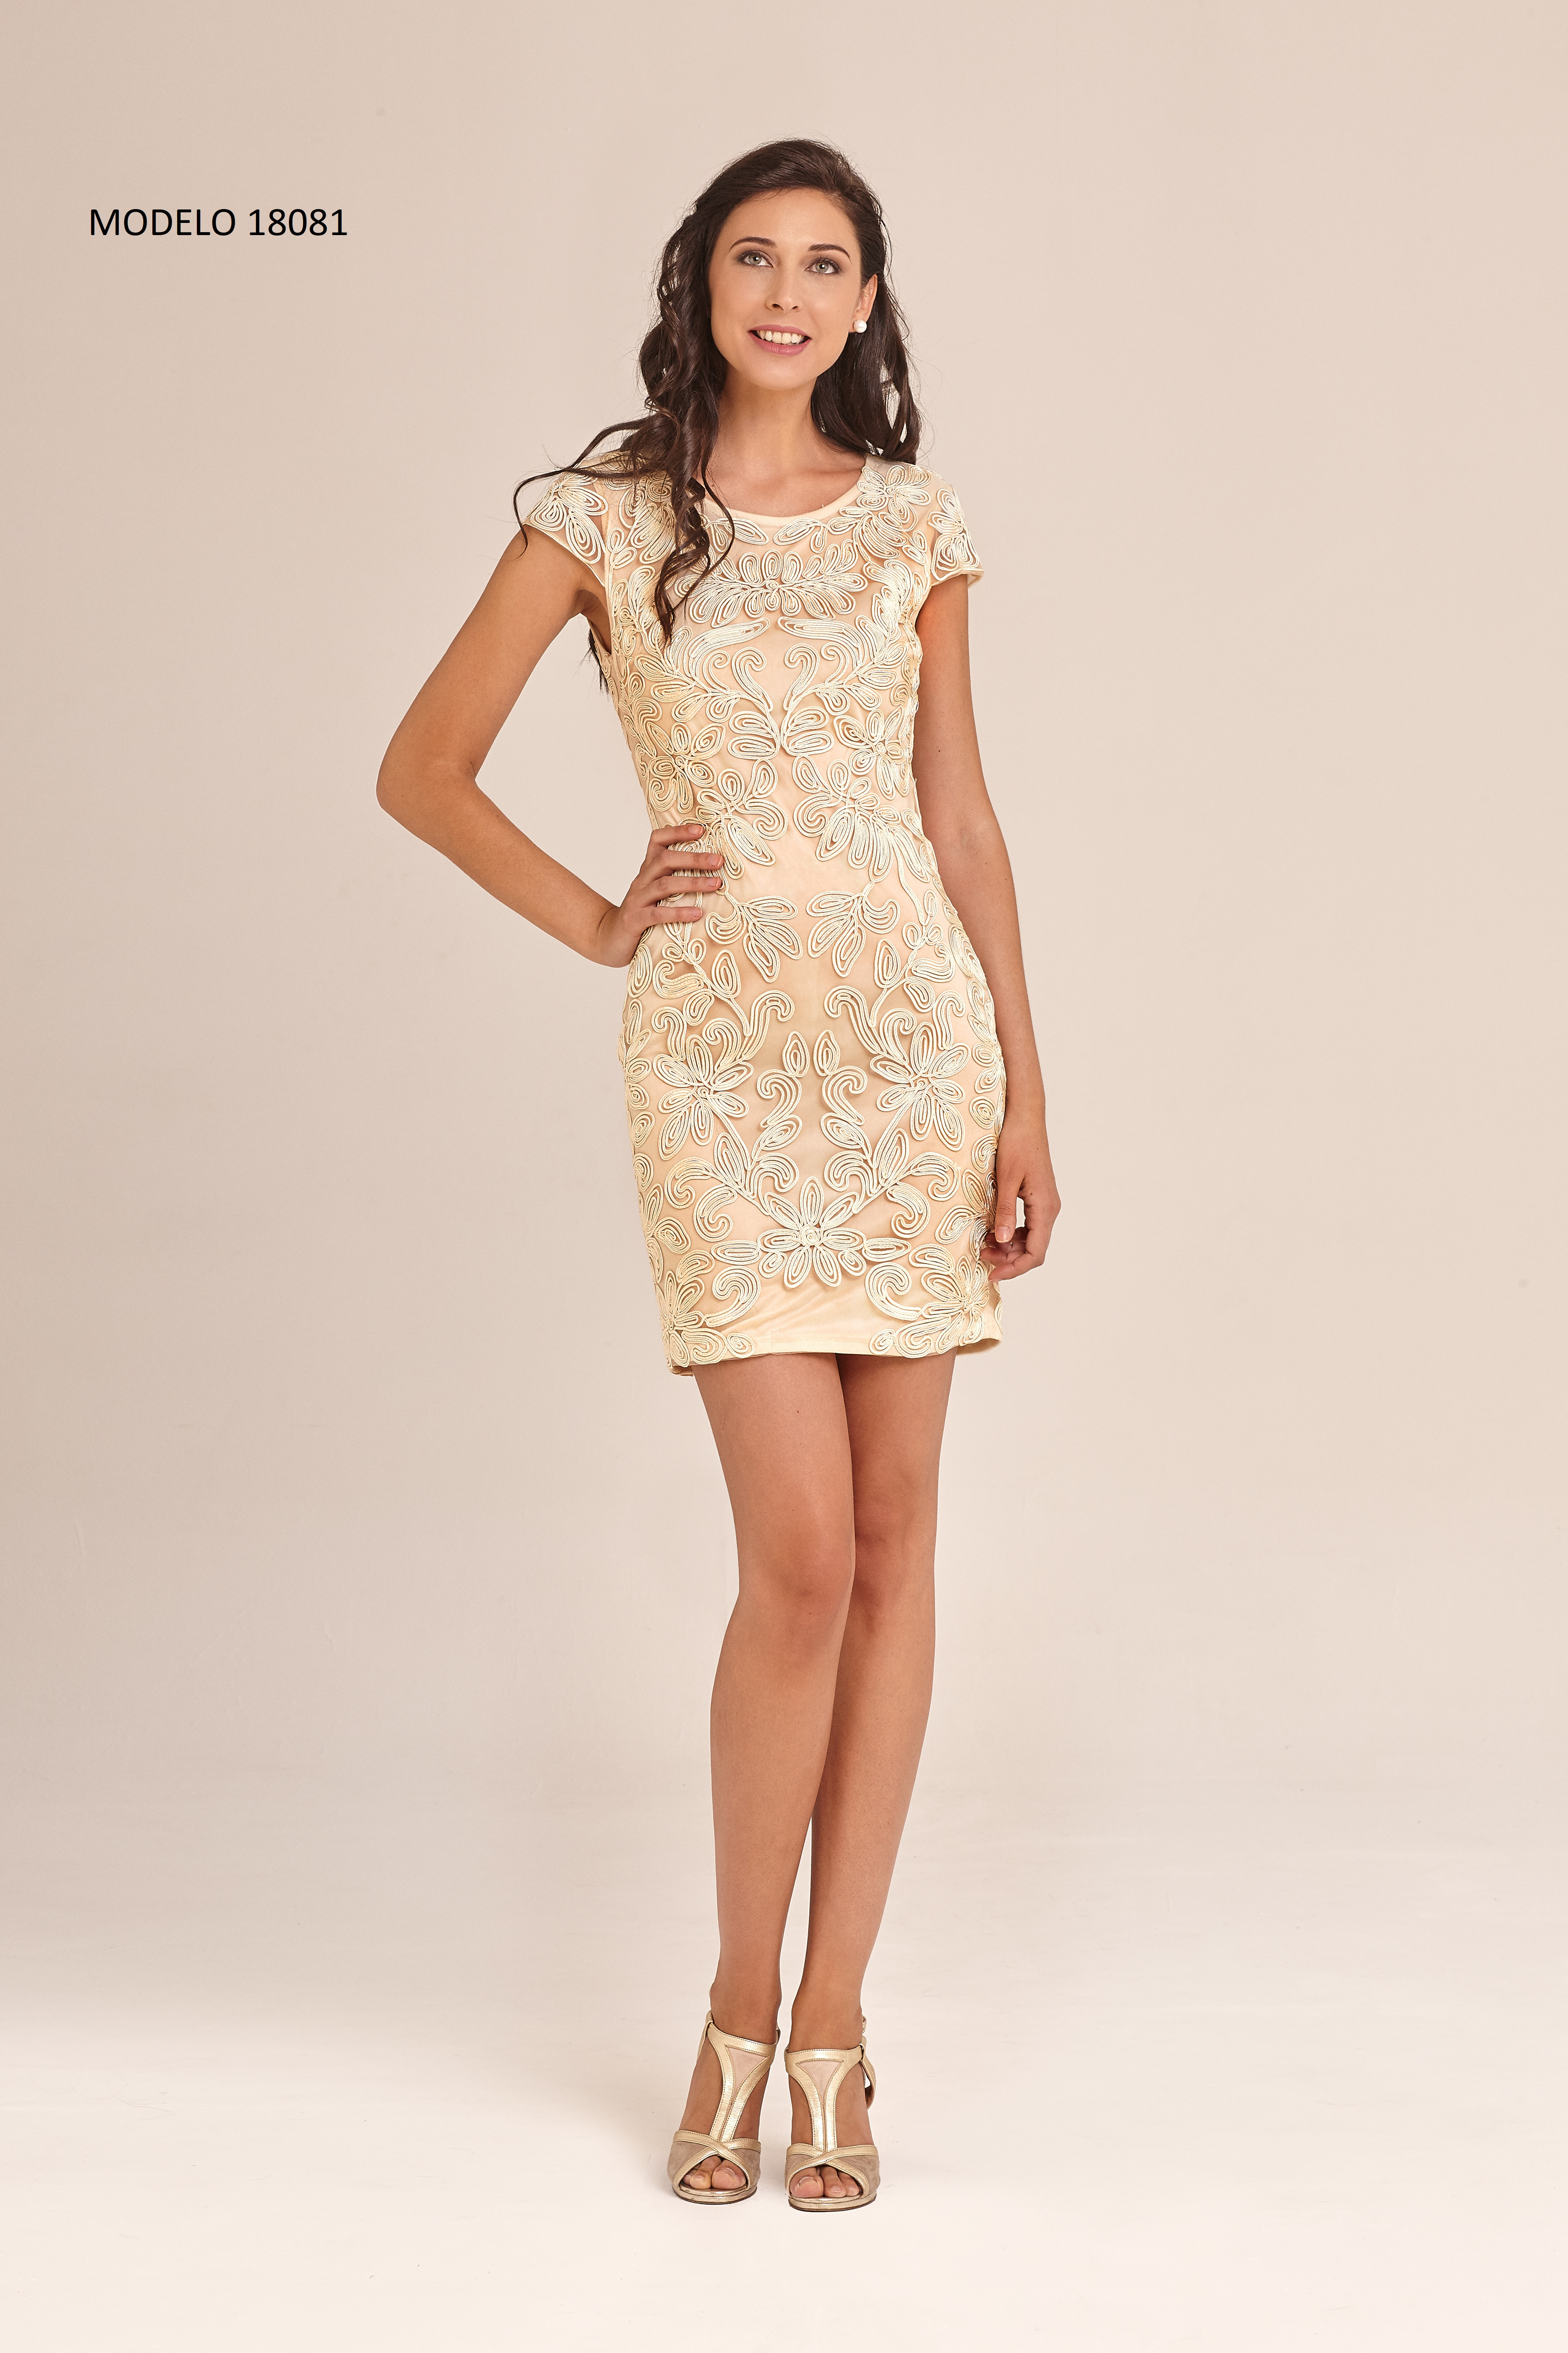 18081 vestido fiesta lentejuelas